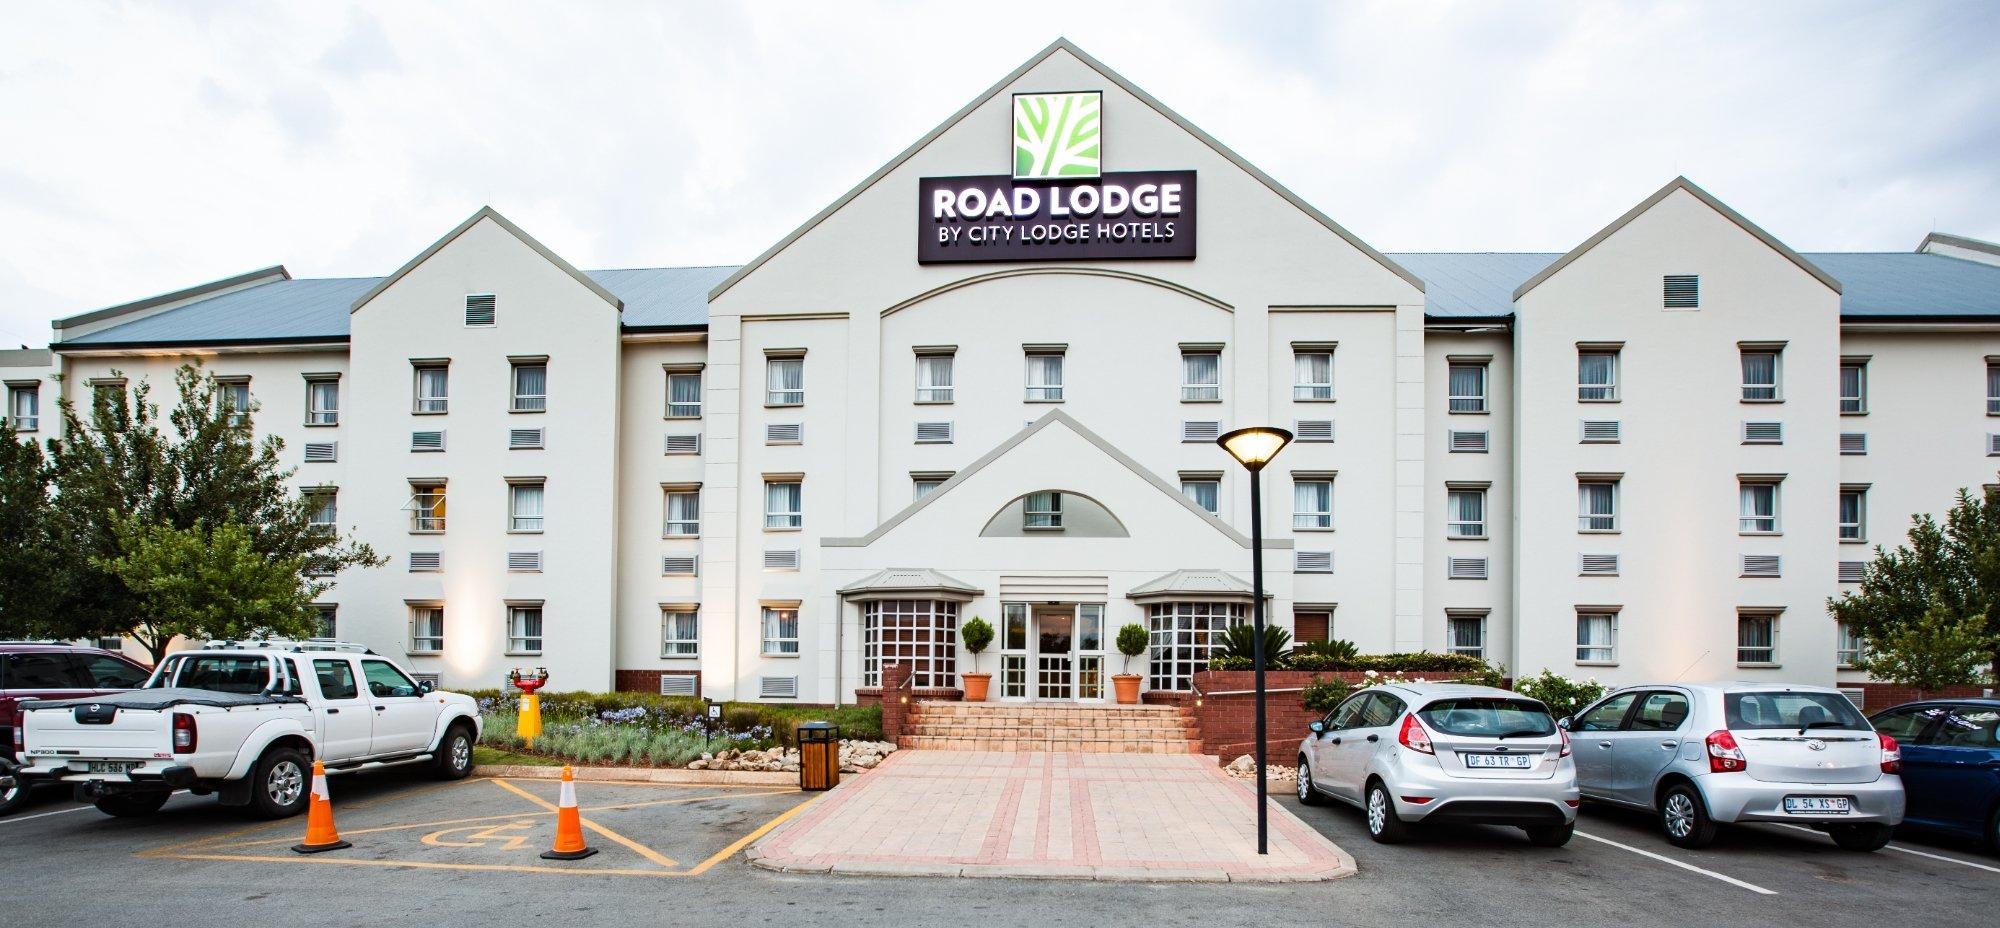 Road Lodge - 波切夫斯特魯姆